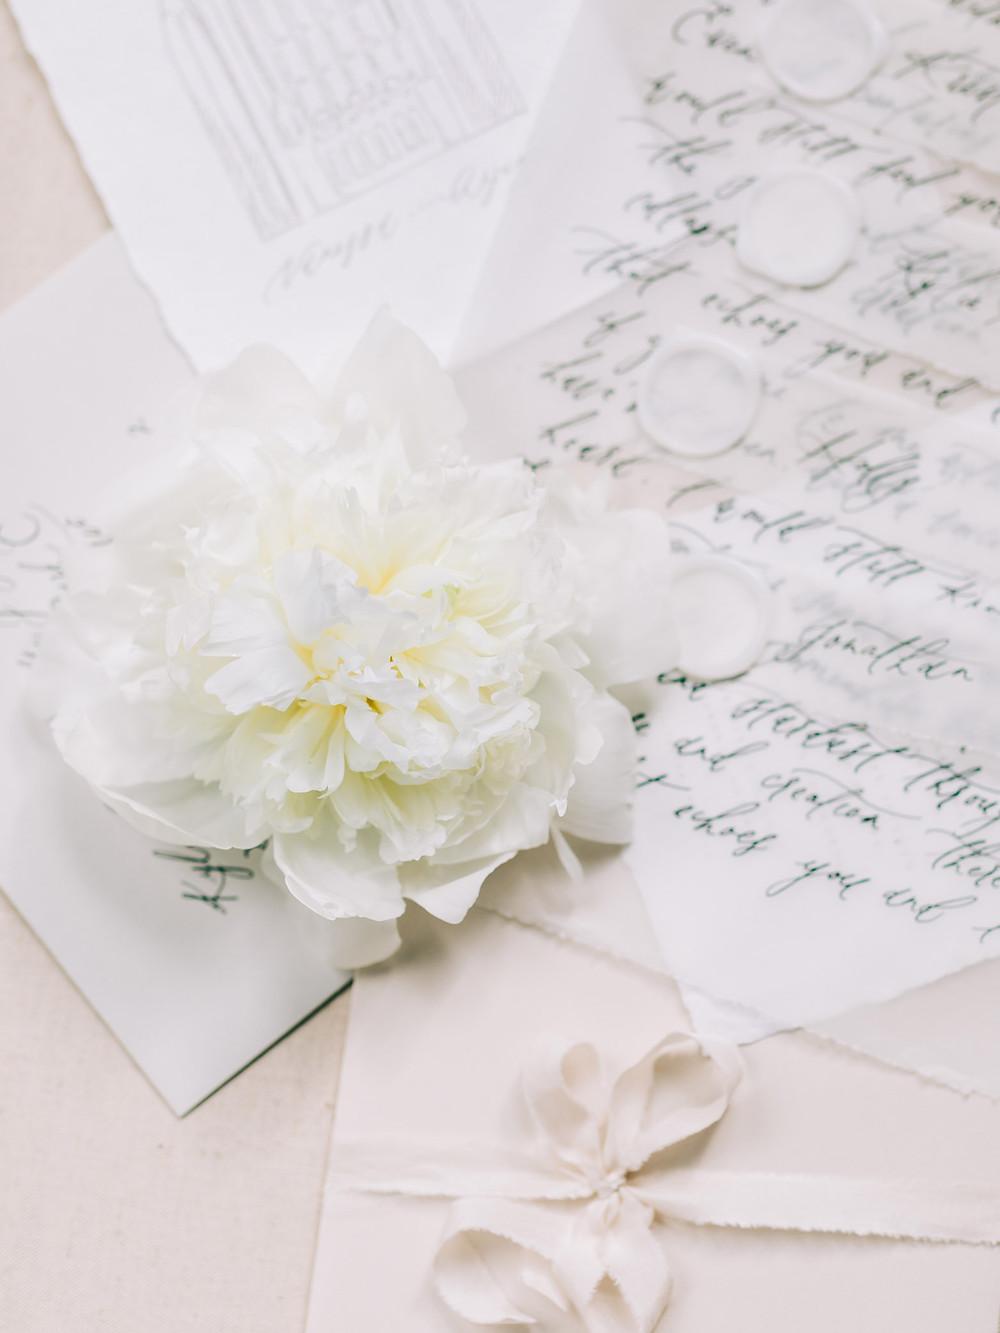 vellum love letter calligraphy